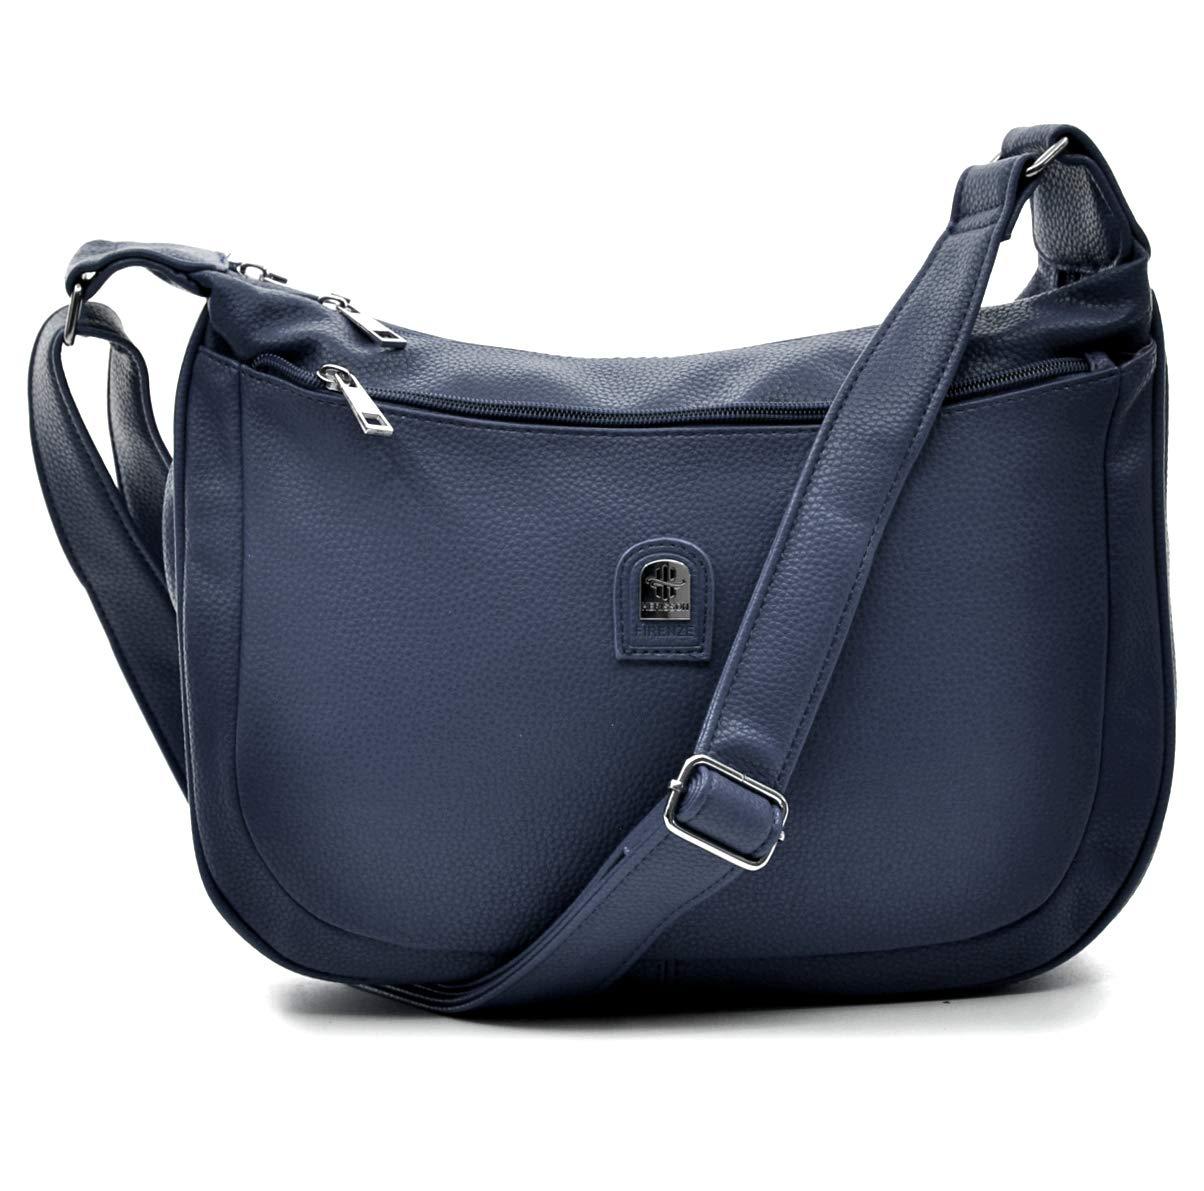 Borsa Herisson Firenze mezzaluna tracolla capiente sportiva comoda zip grande blu